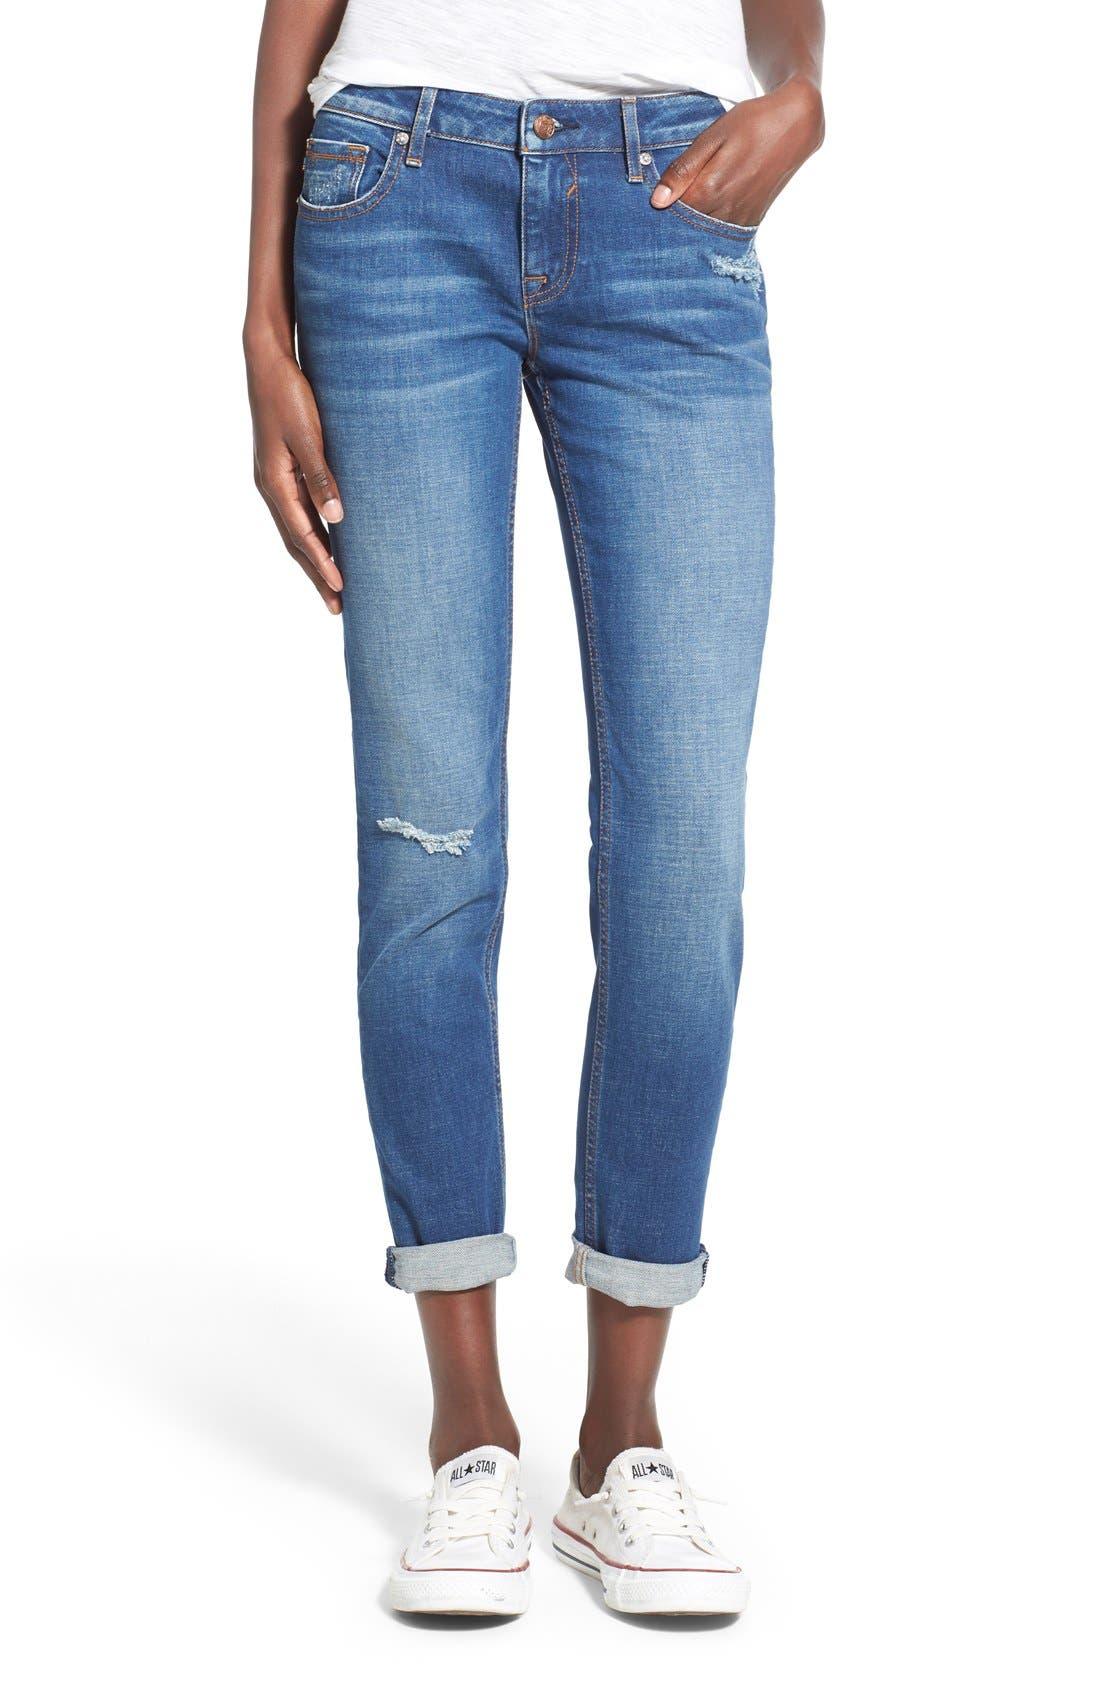 Main Image - Vigoss 'Tomboy Thompson' Destructed Jeans (Medium Wash)